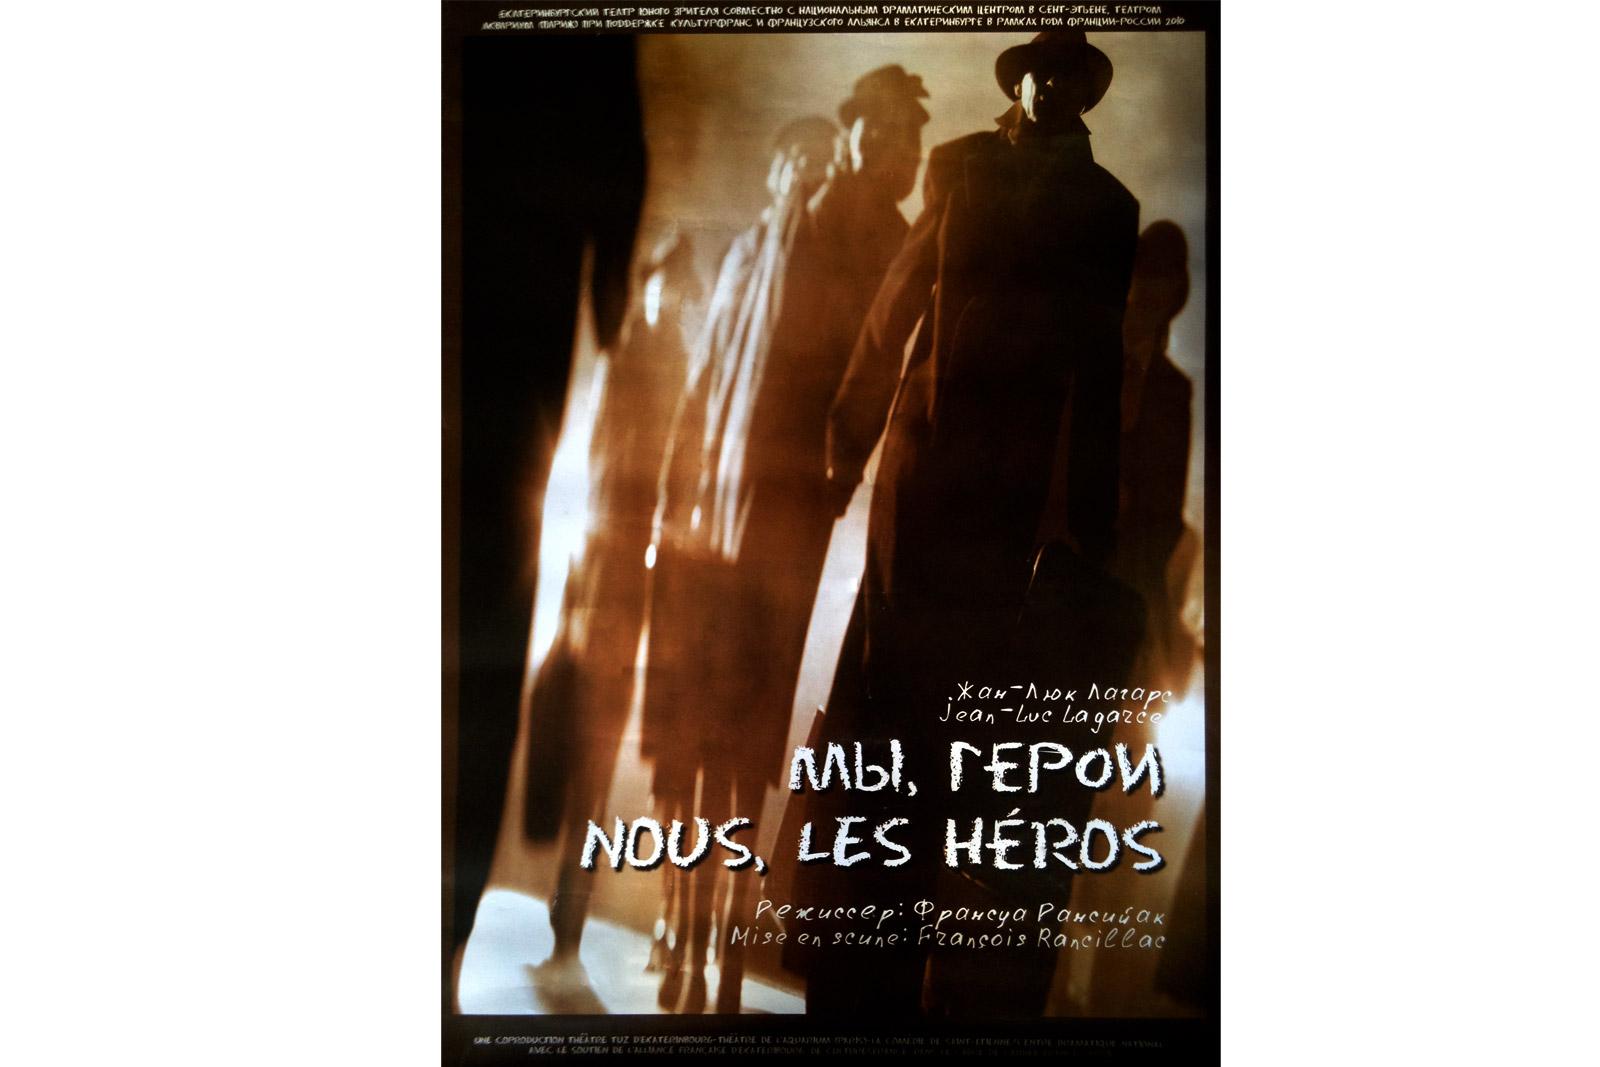 Scénographie de Raymond Sarti, Scénographie de Raymond Sarti, Scénographie de Raymond Sarti, Nous, Les Héros